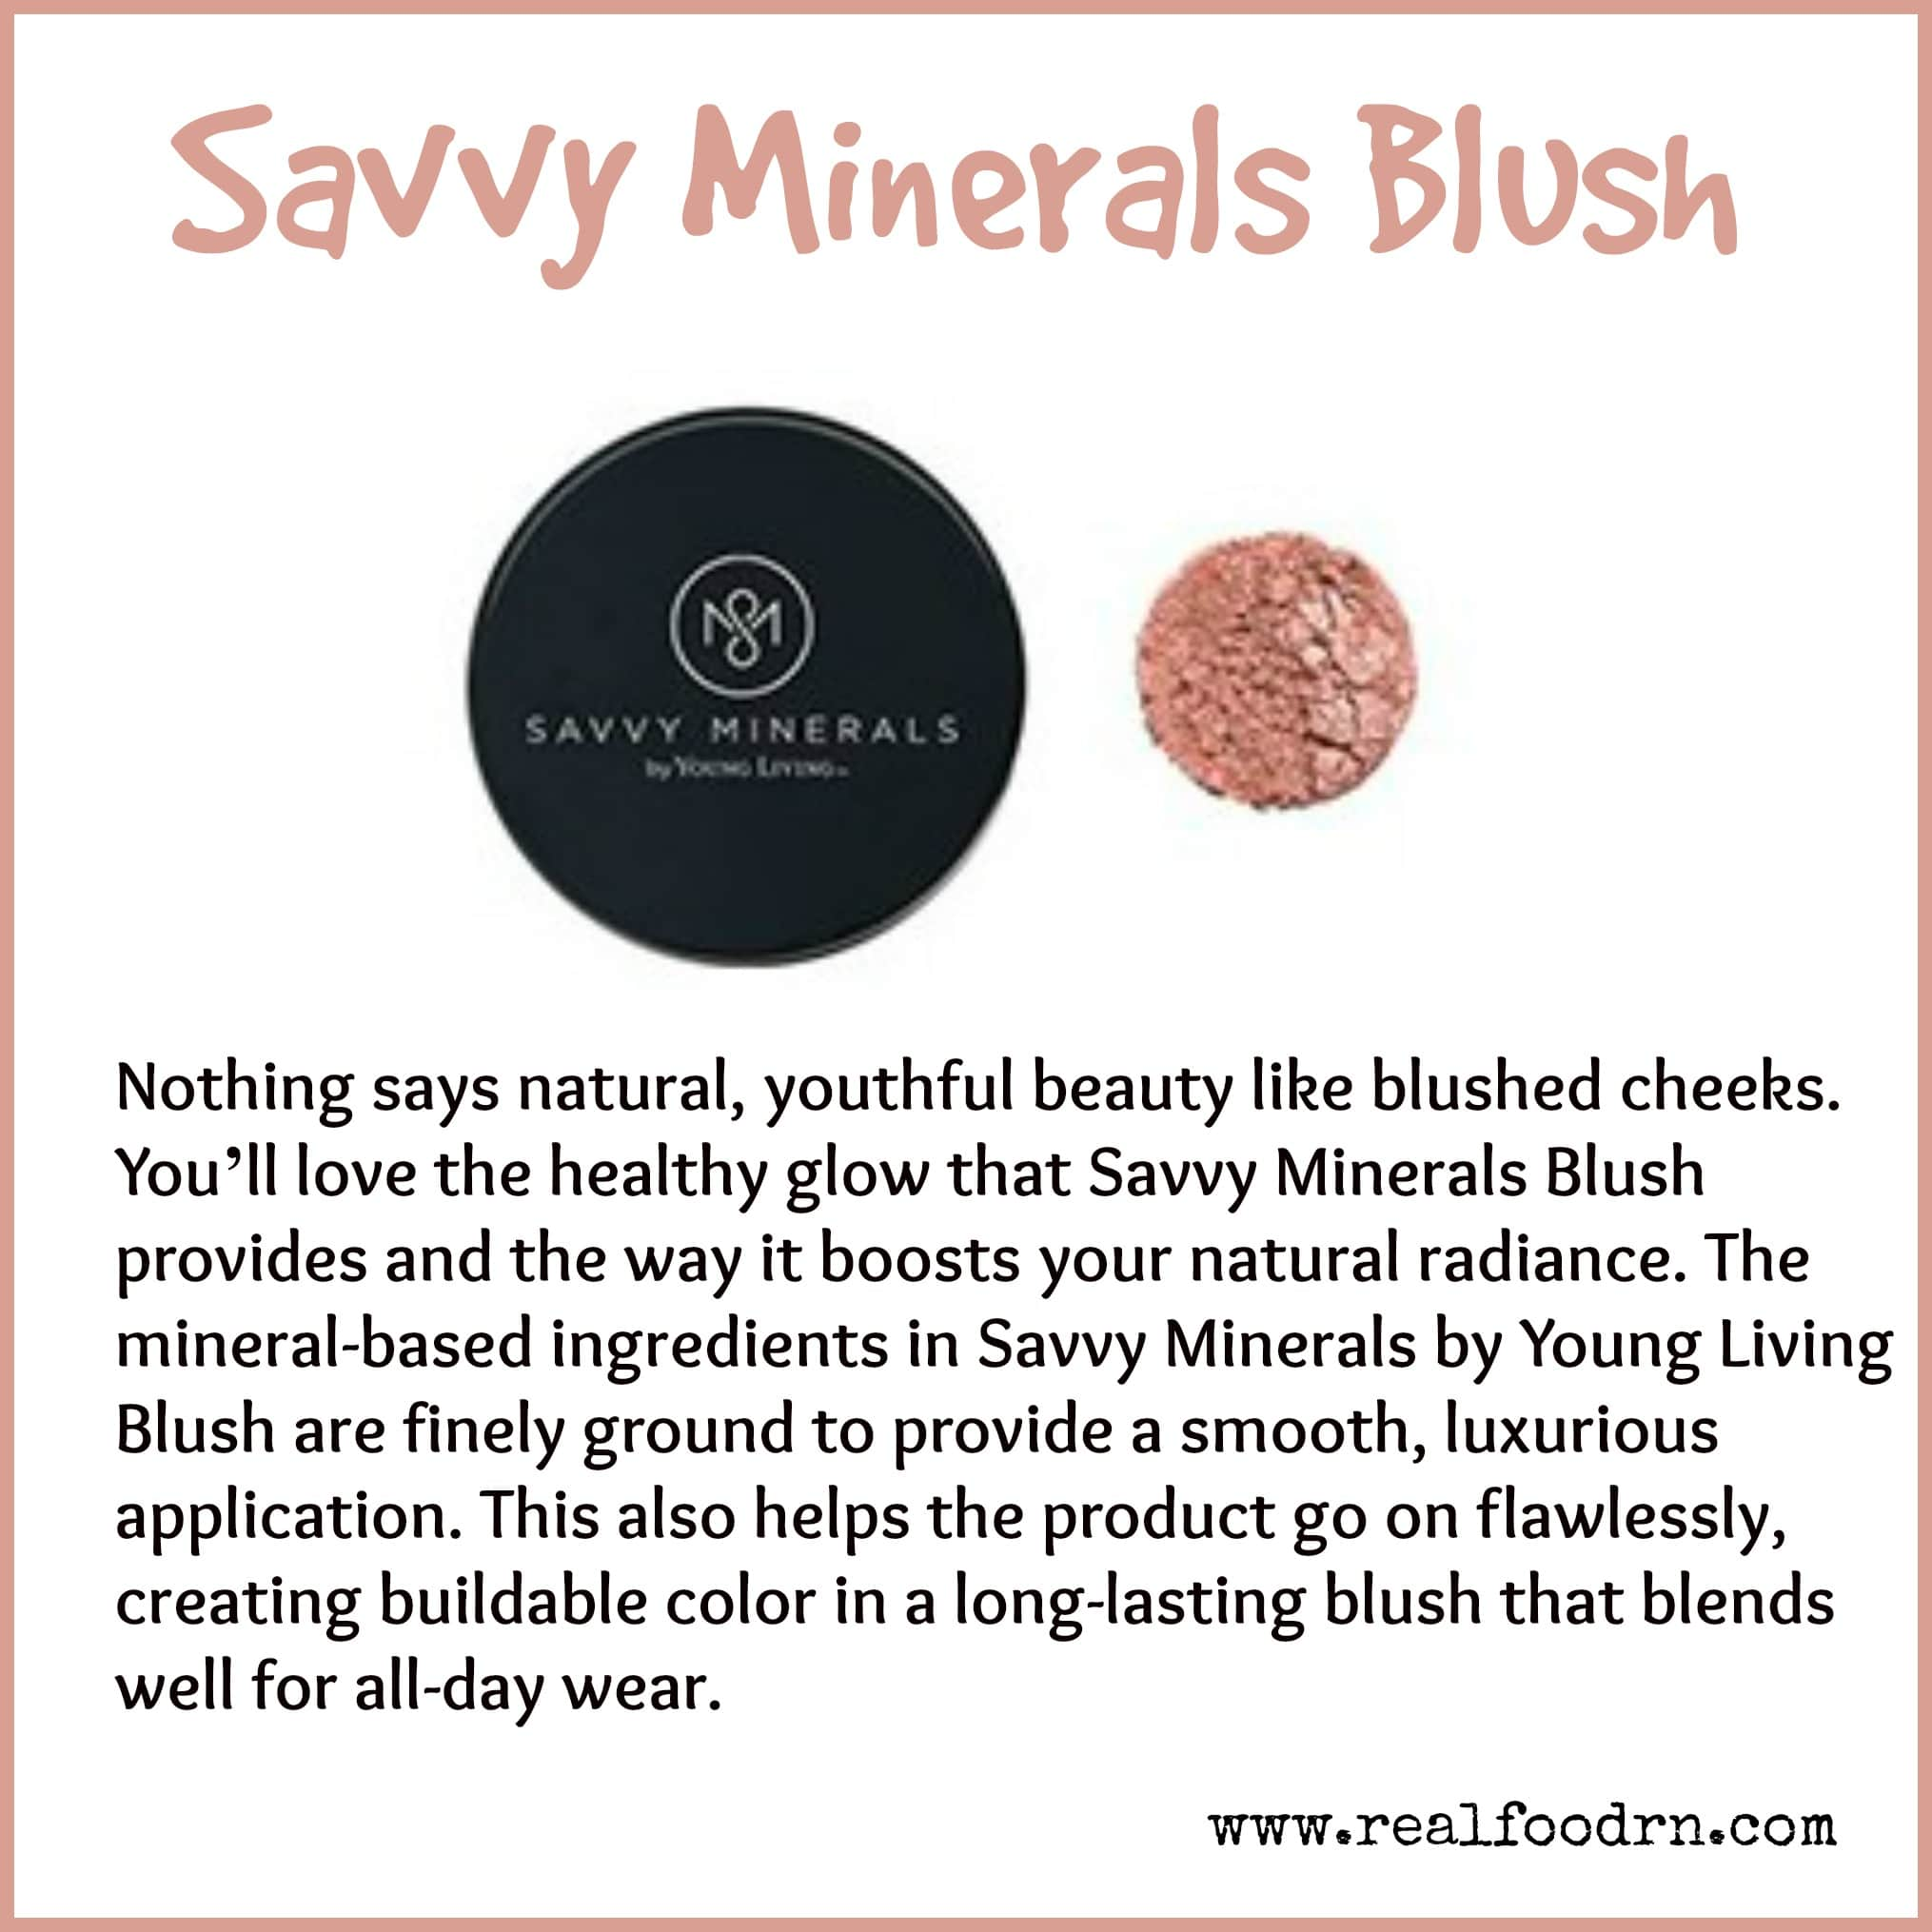 Savvy Minerals Blush